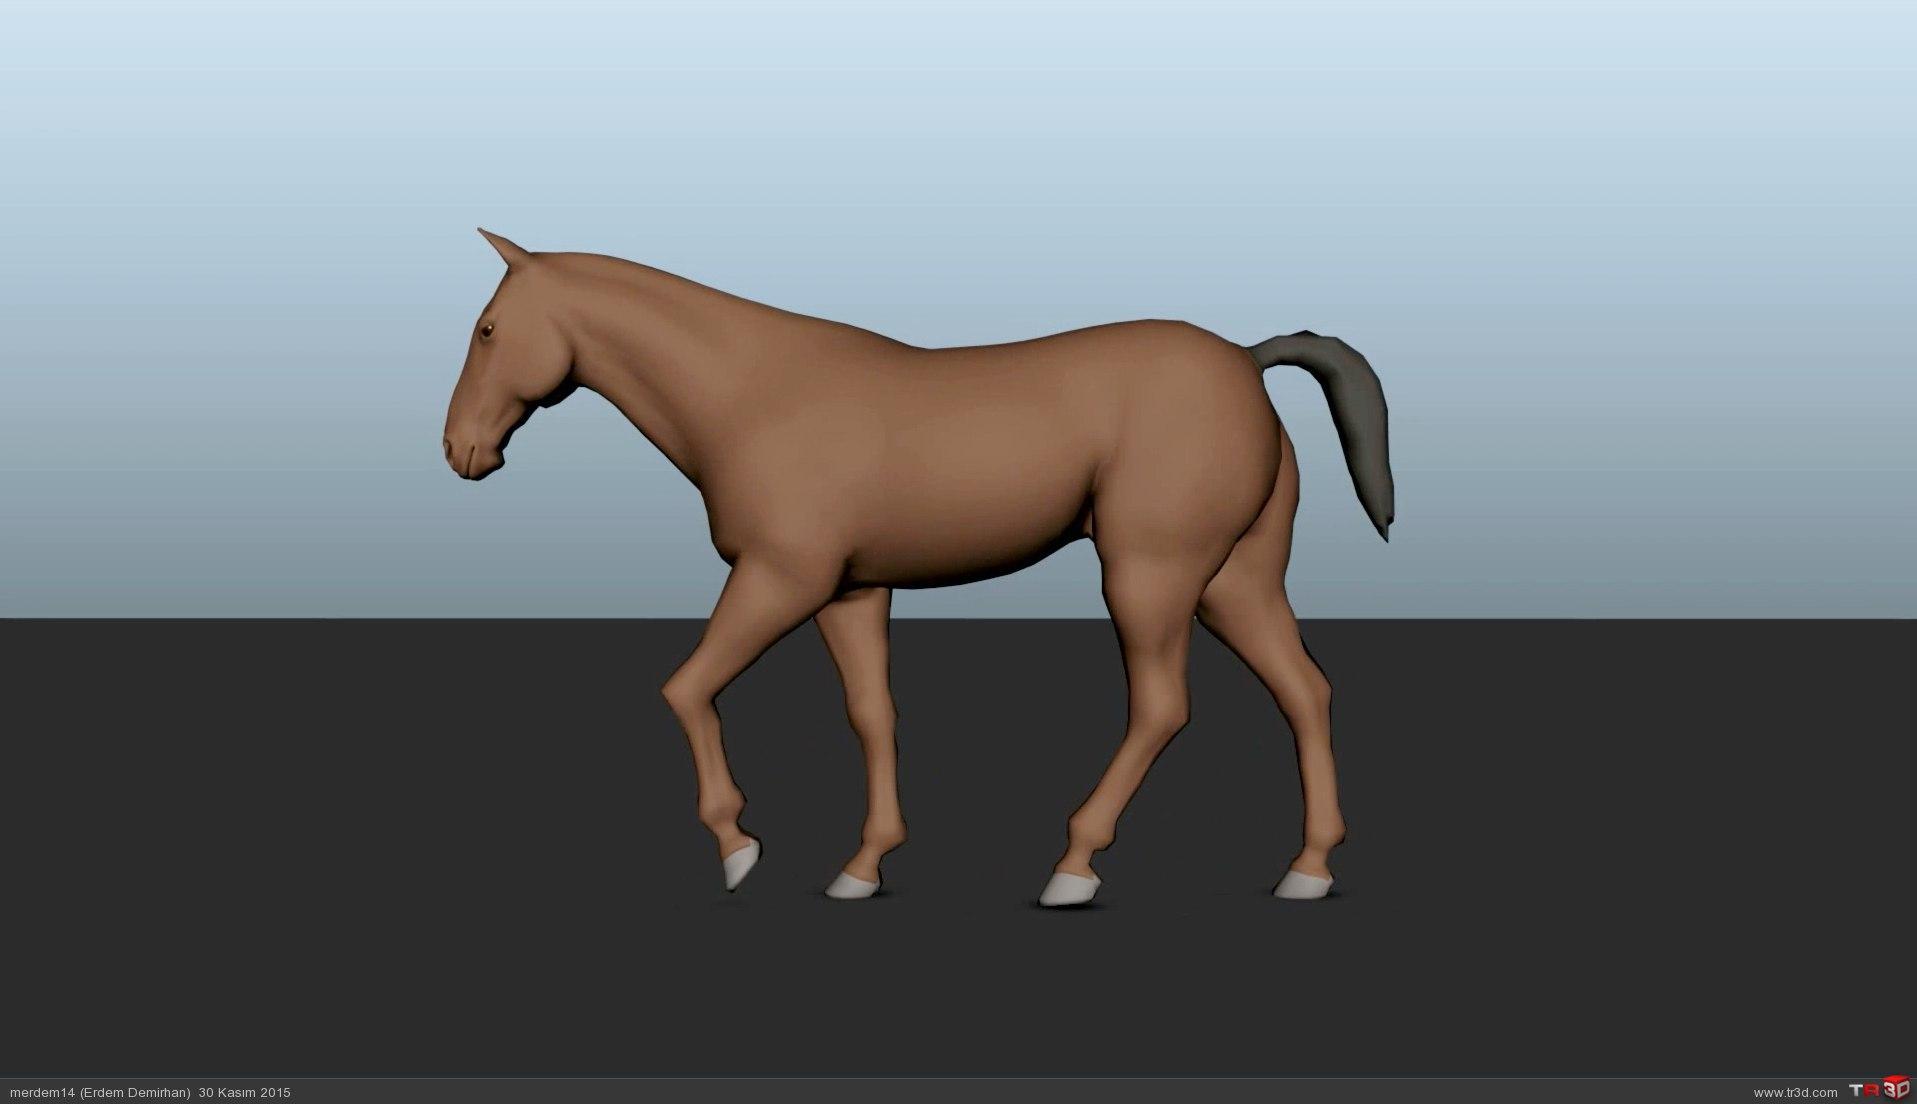 At Yürüme Animasyonu